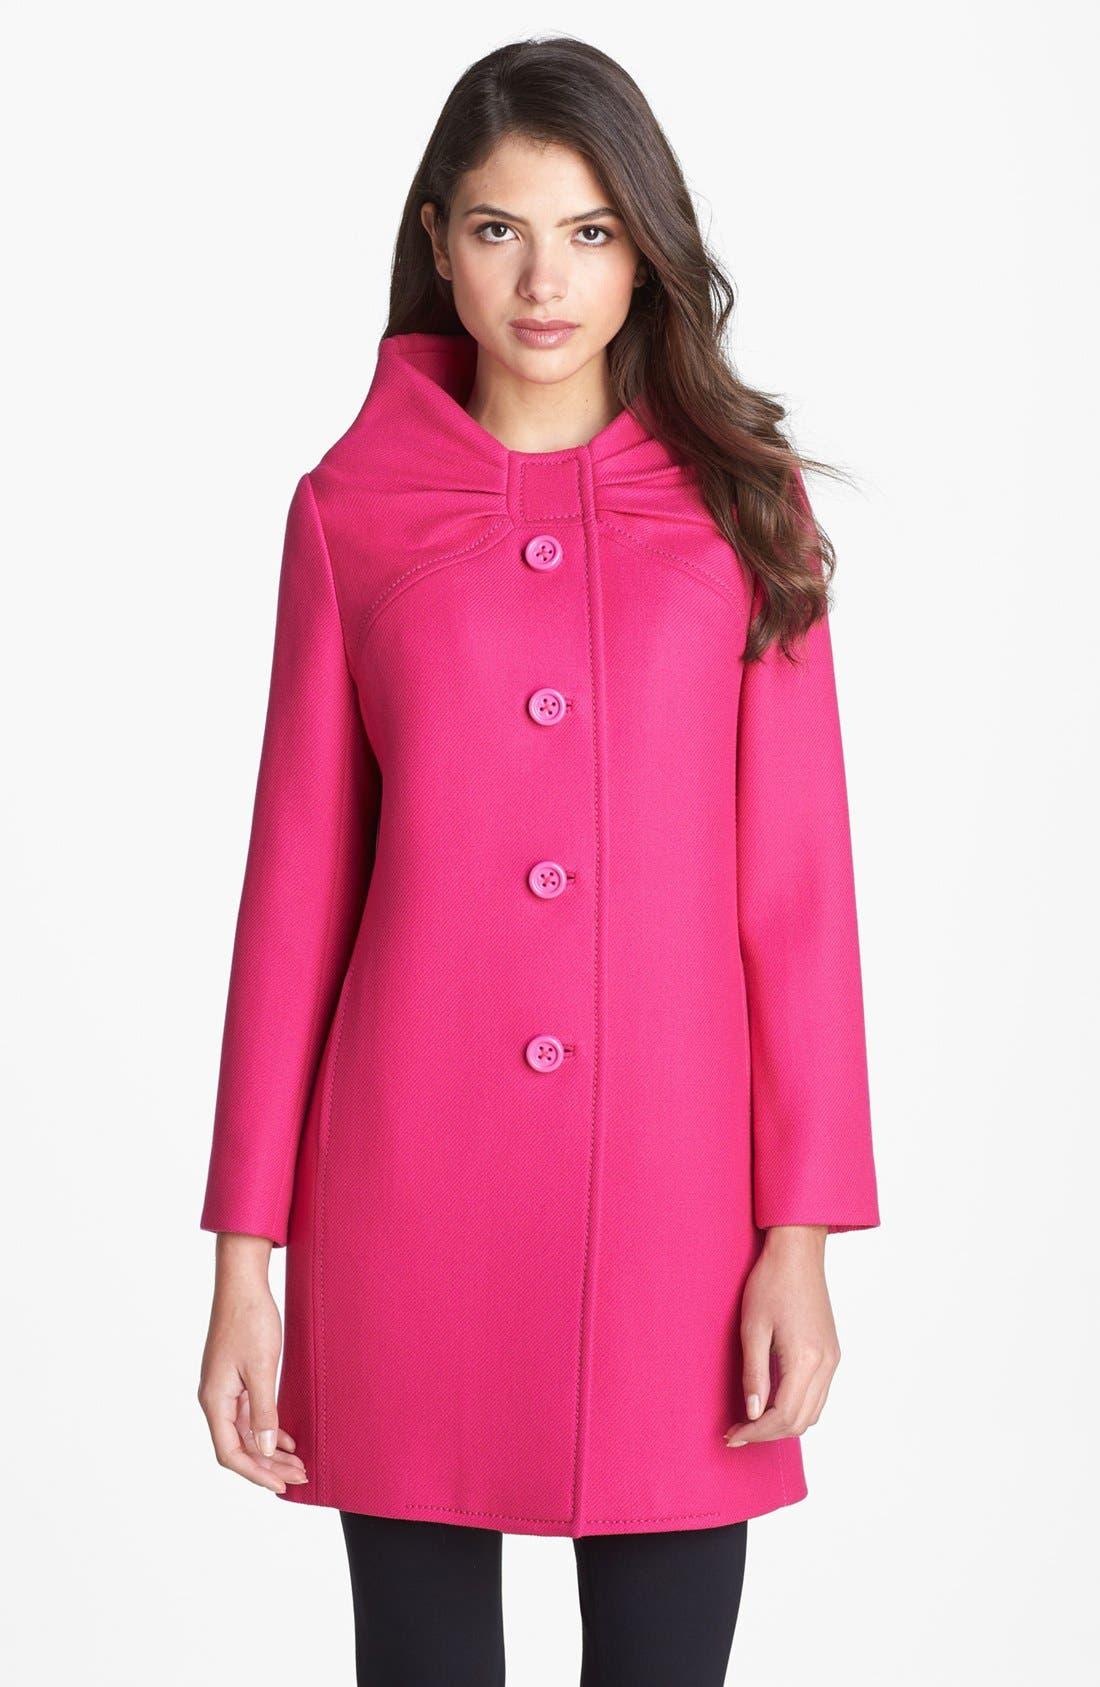 Alternate Image 1 Selected - kate spade new york 'etta' wool coat